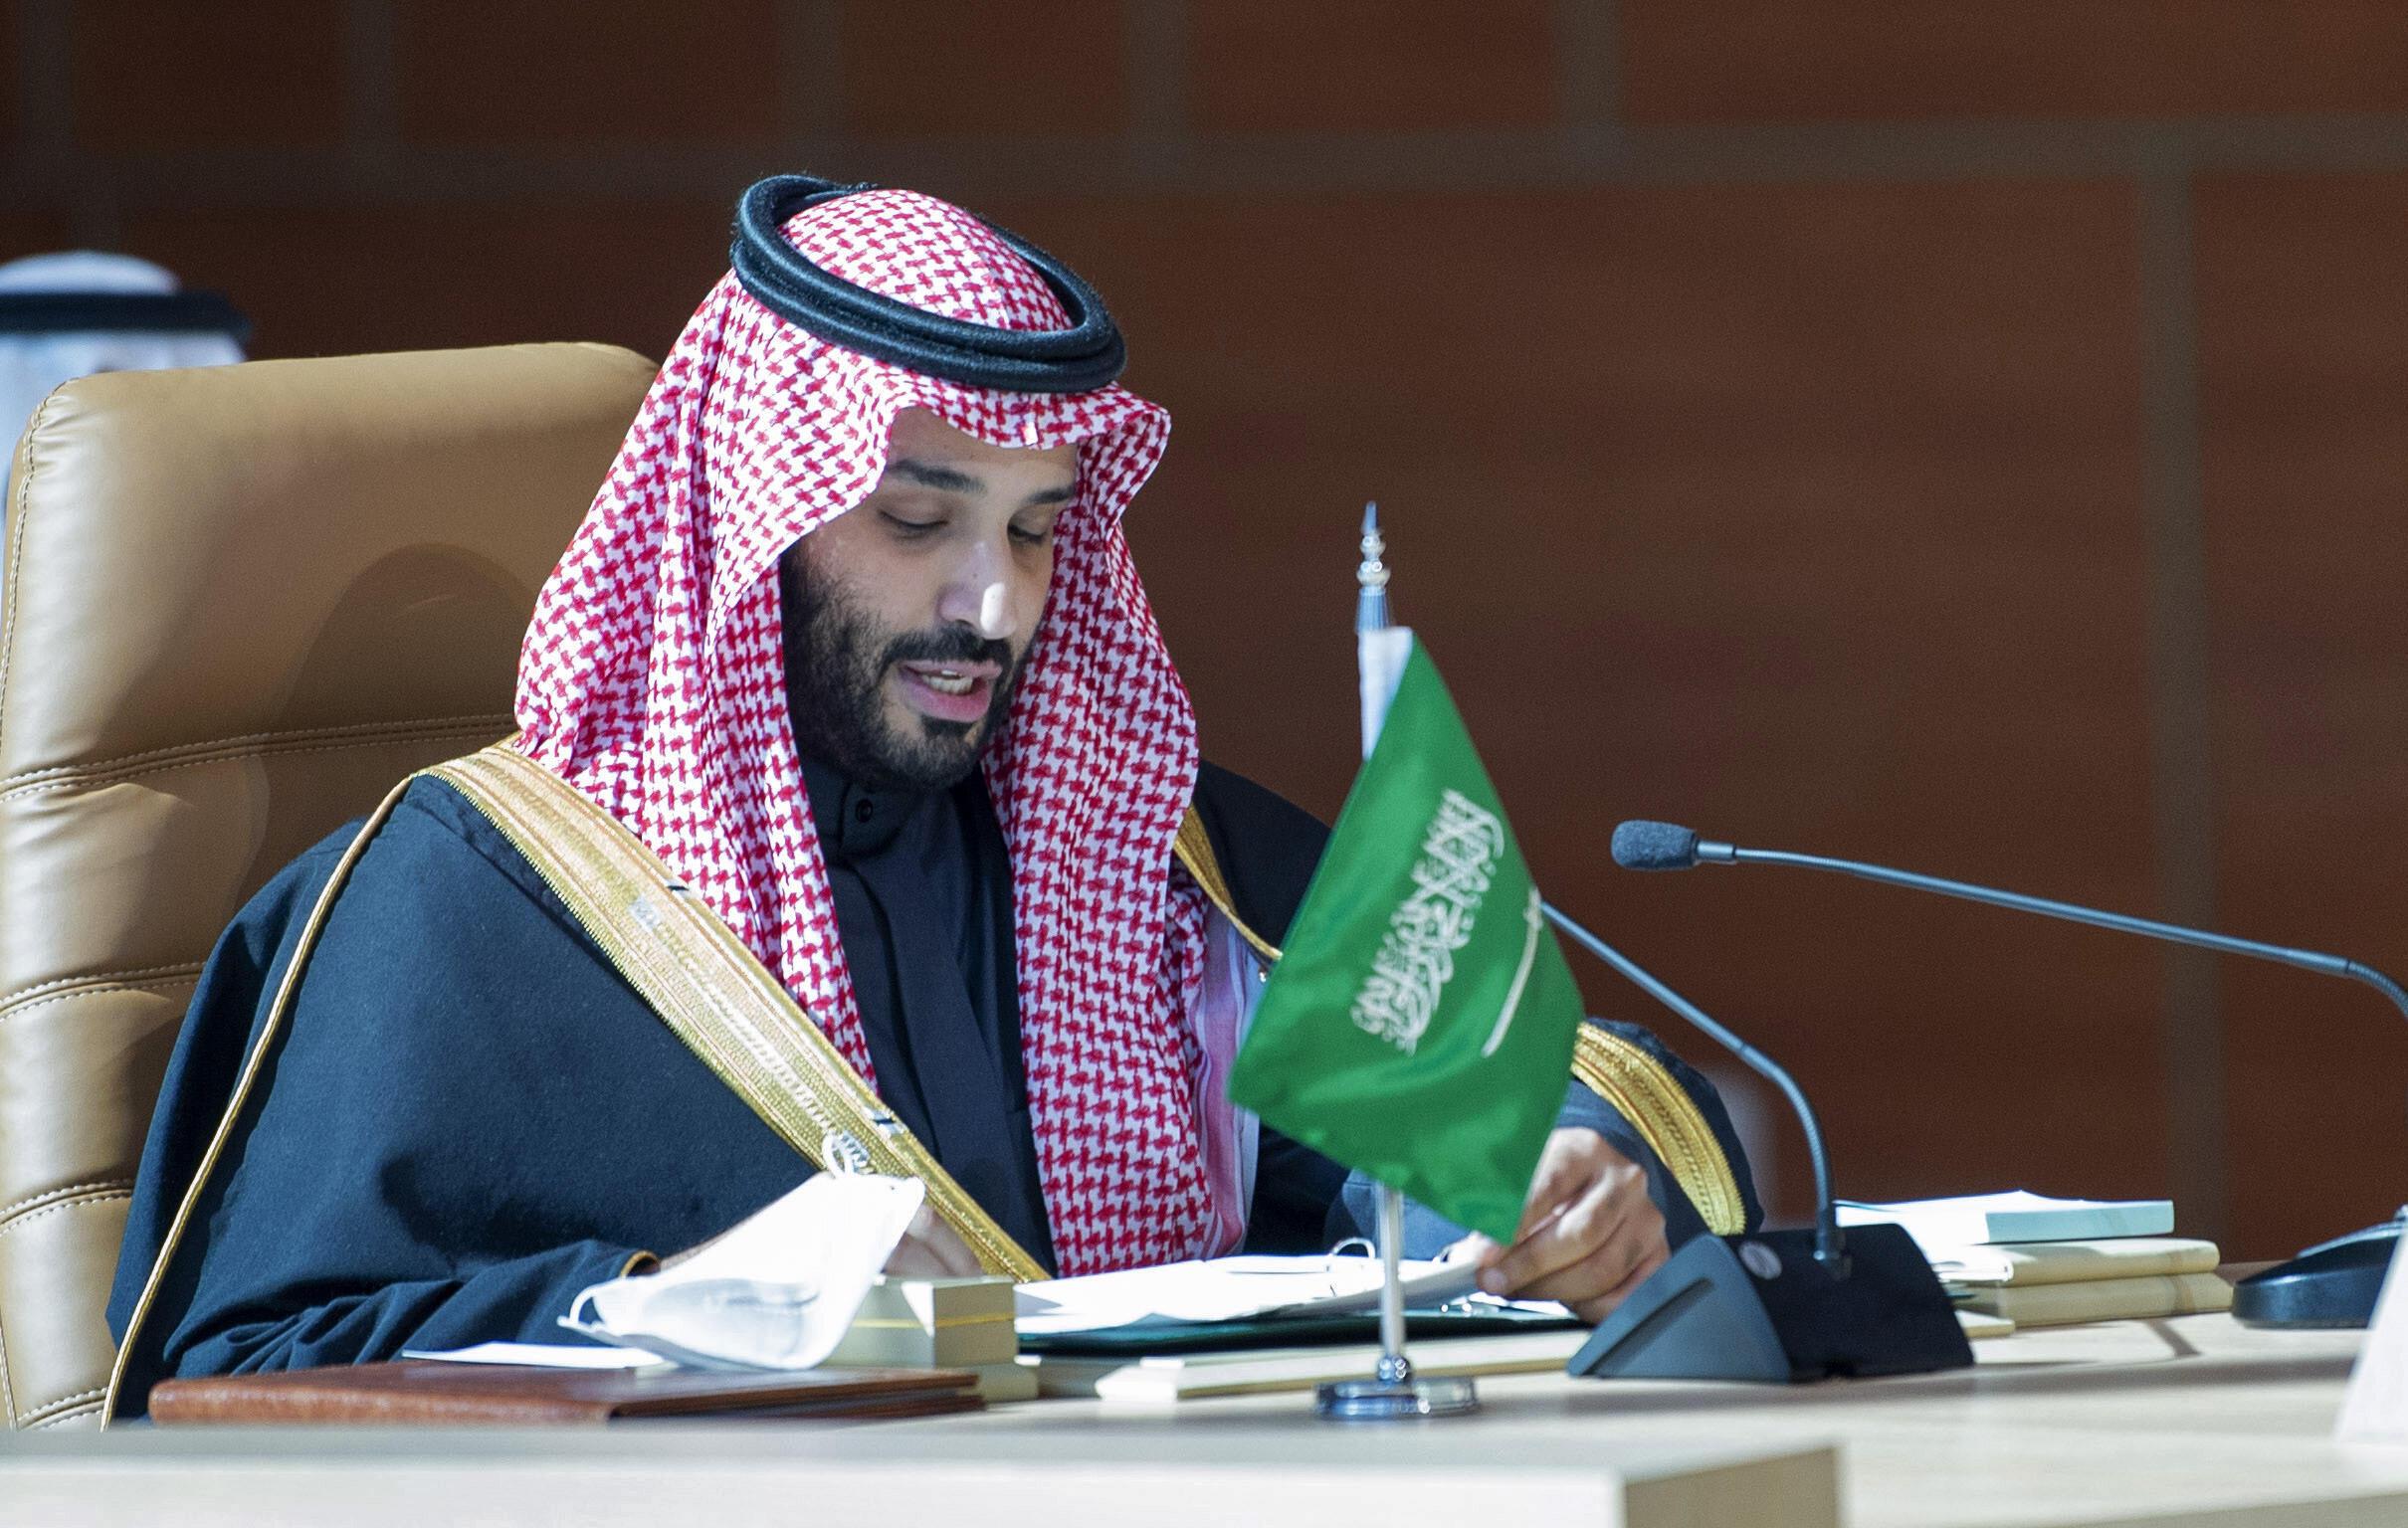 Crown Prince Mohammed bin Salman, Saudi Arabia's de factor ruler, addresses a Gulf summit in January